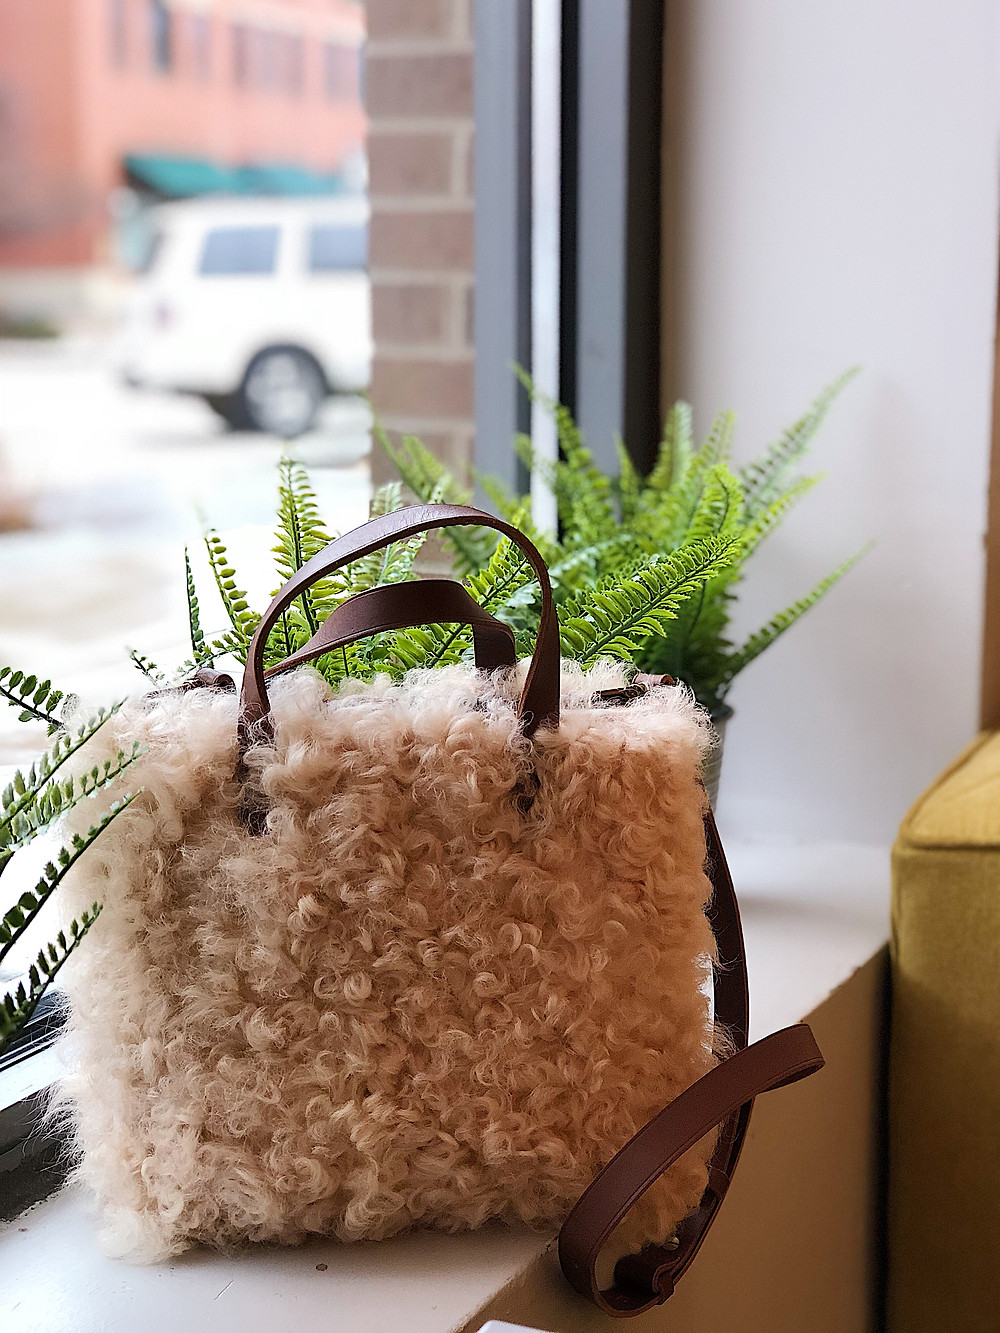 shearling tote bag